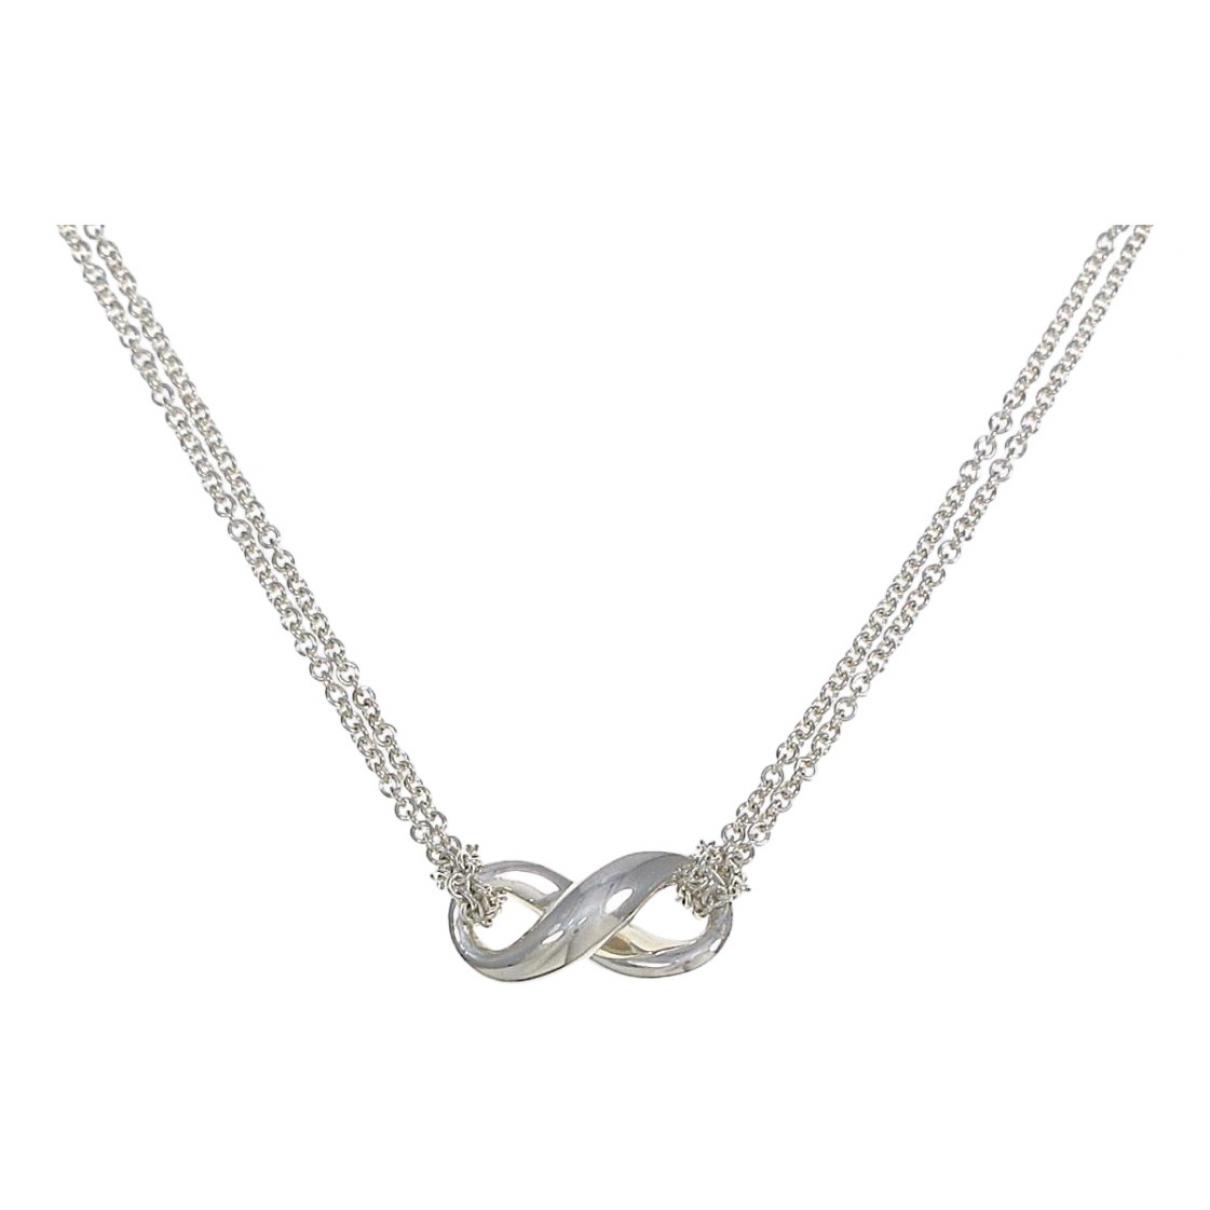 Tiffany & Co Tiffany Infinity Kette in Silber